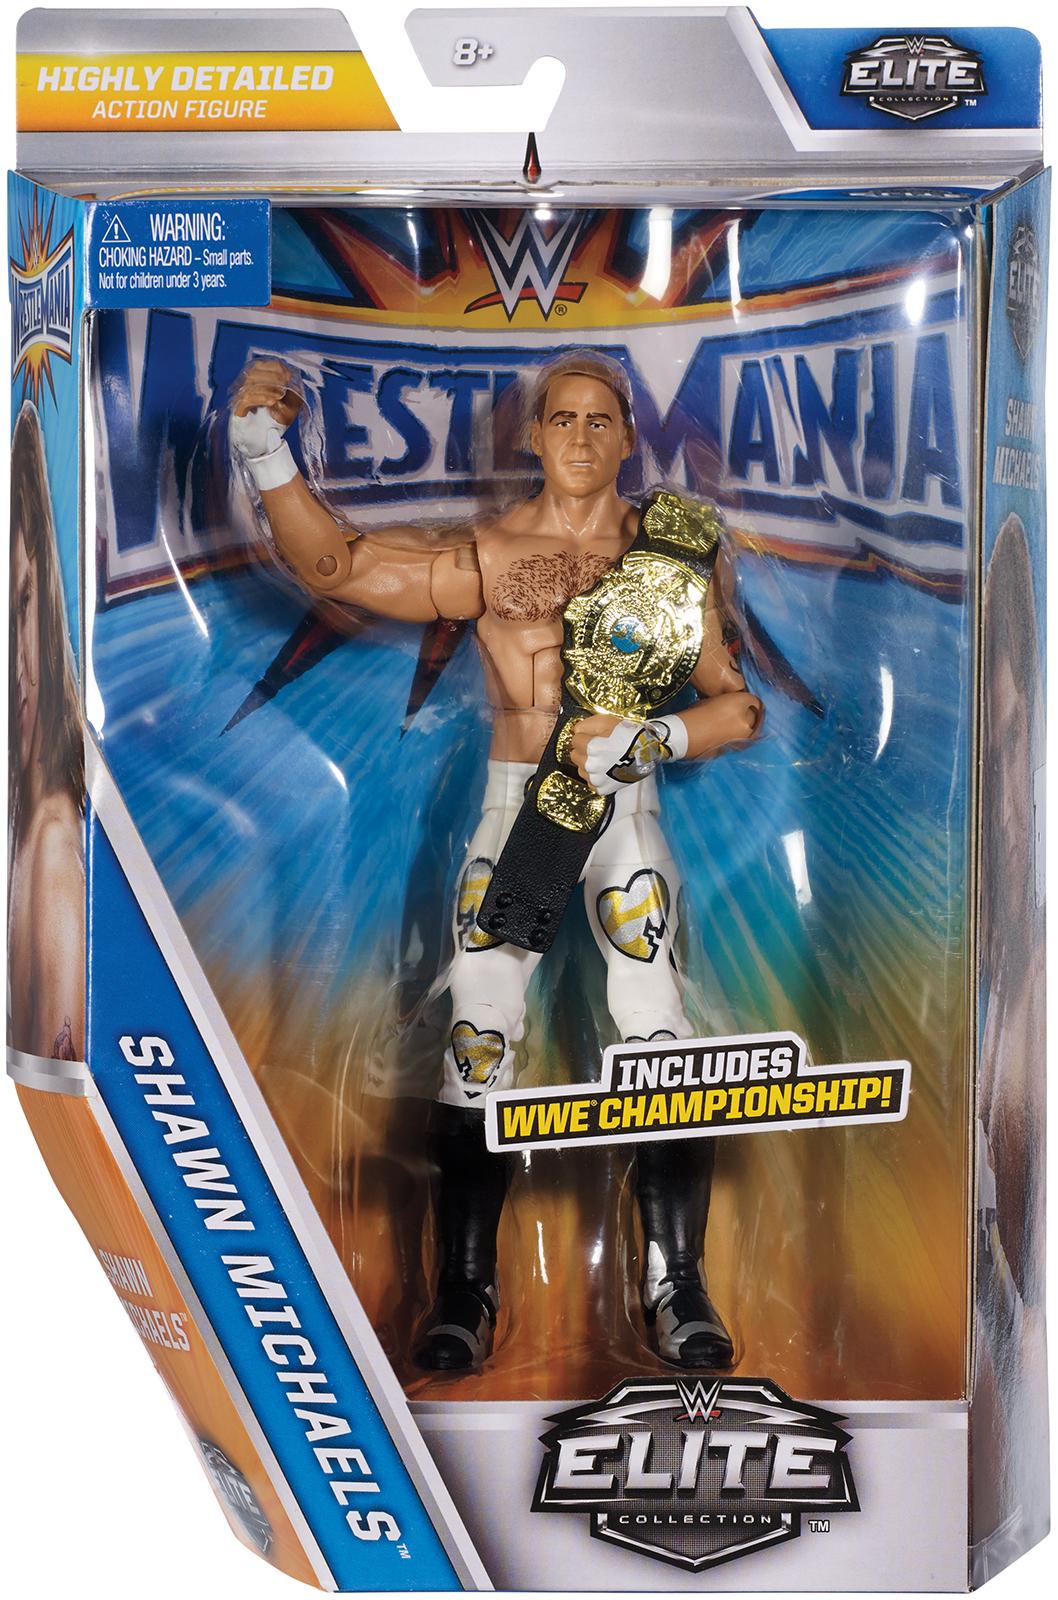 WWE Shawn Michaels WrestleMania 33 Elite Toy Wrestling